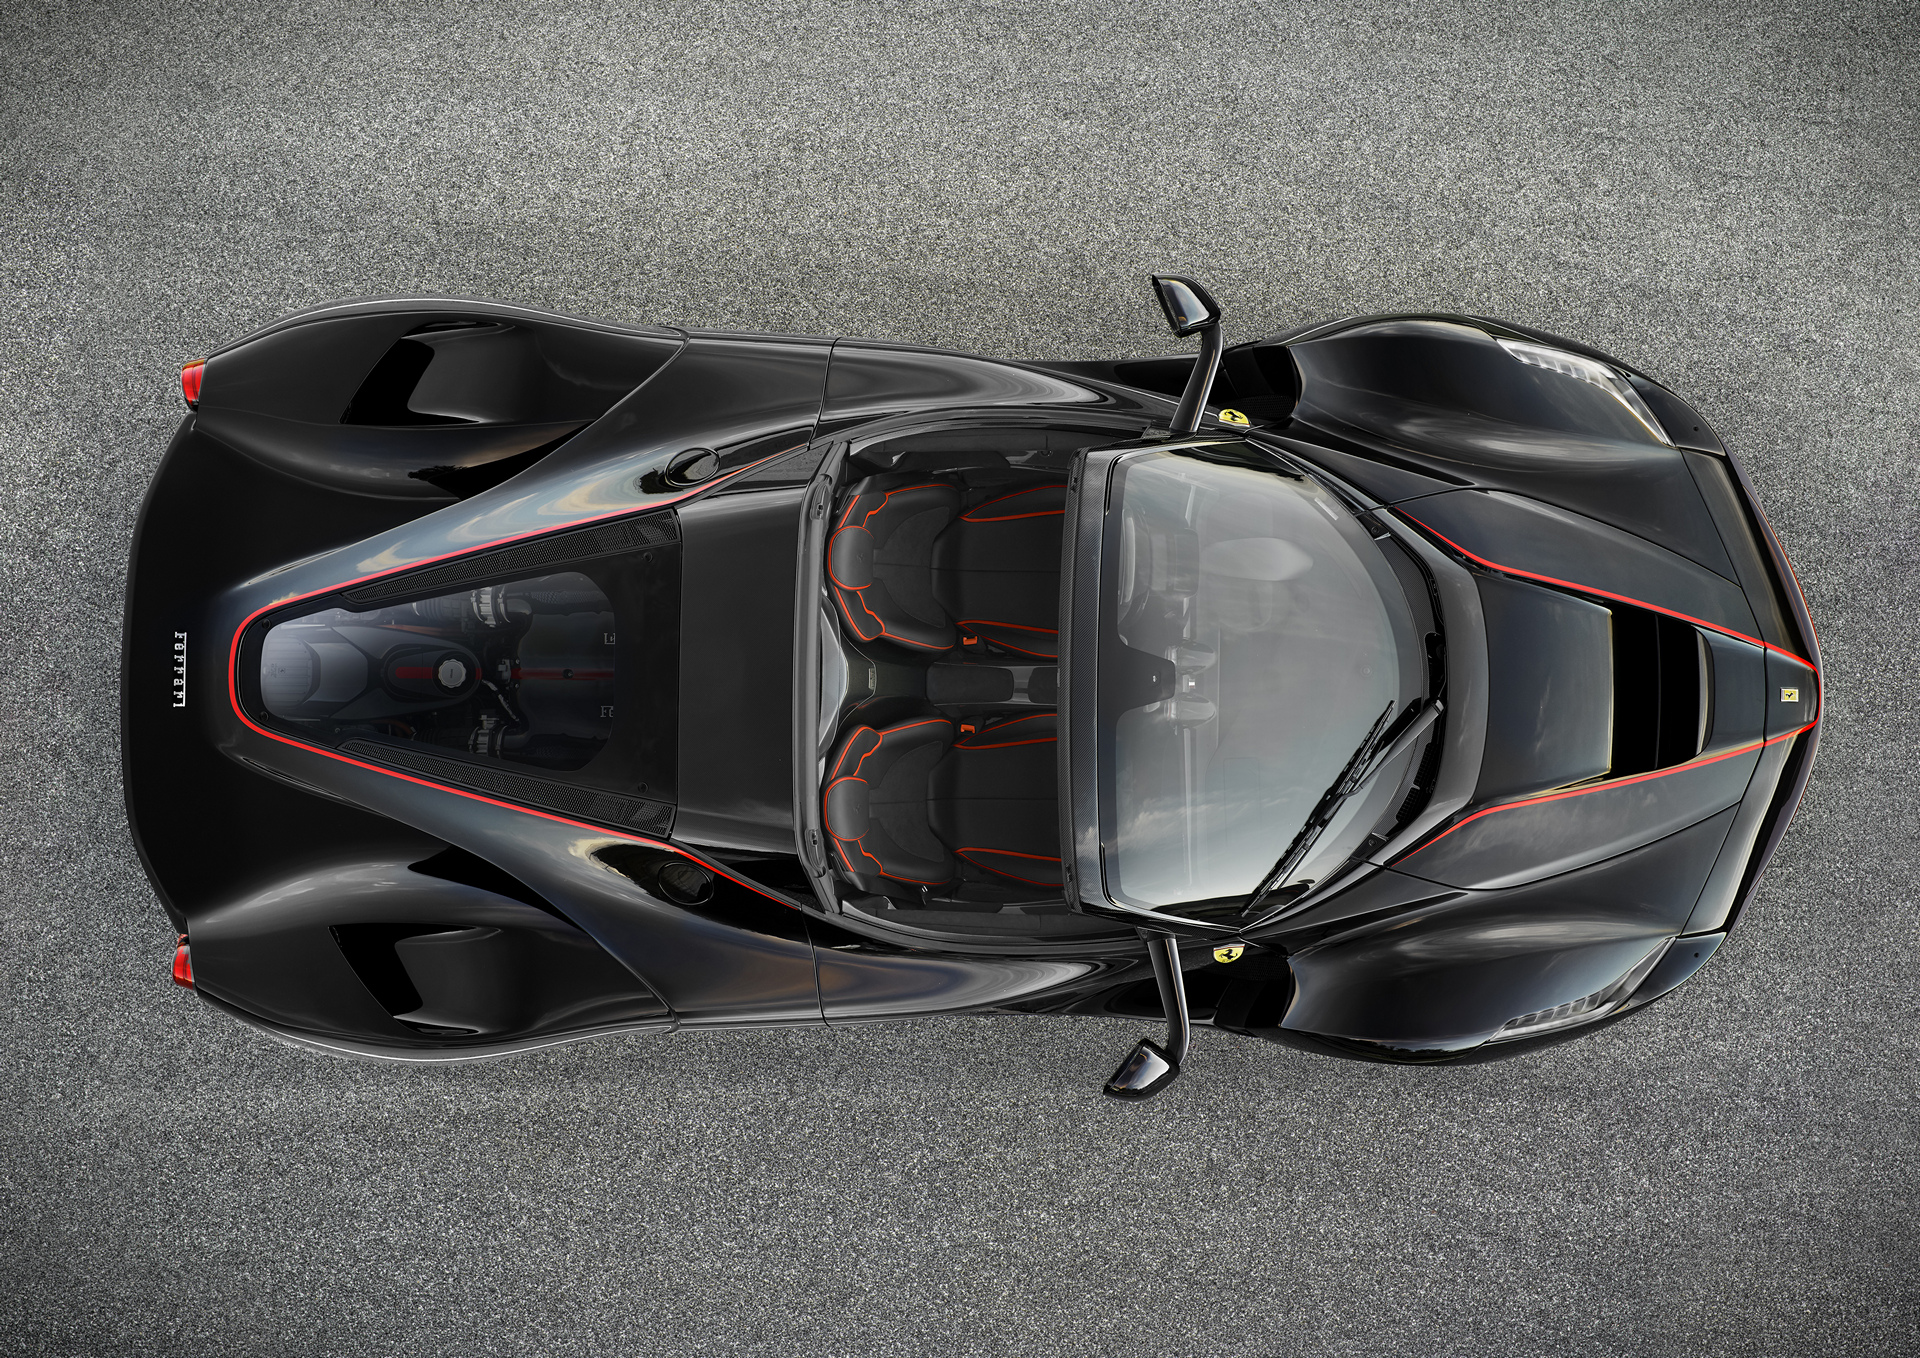 Ferrari LaFerrari © Fiat Chrysler Automobiles N.V.